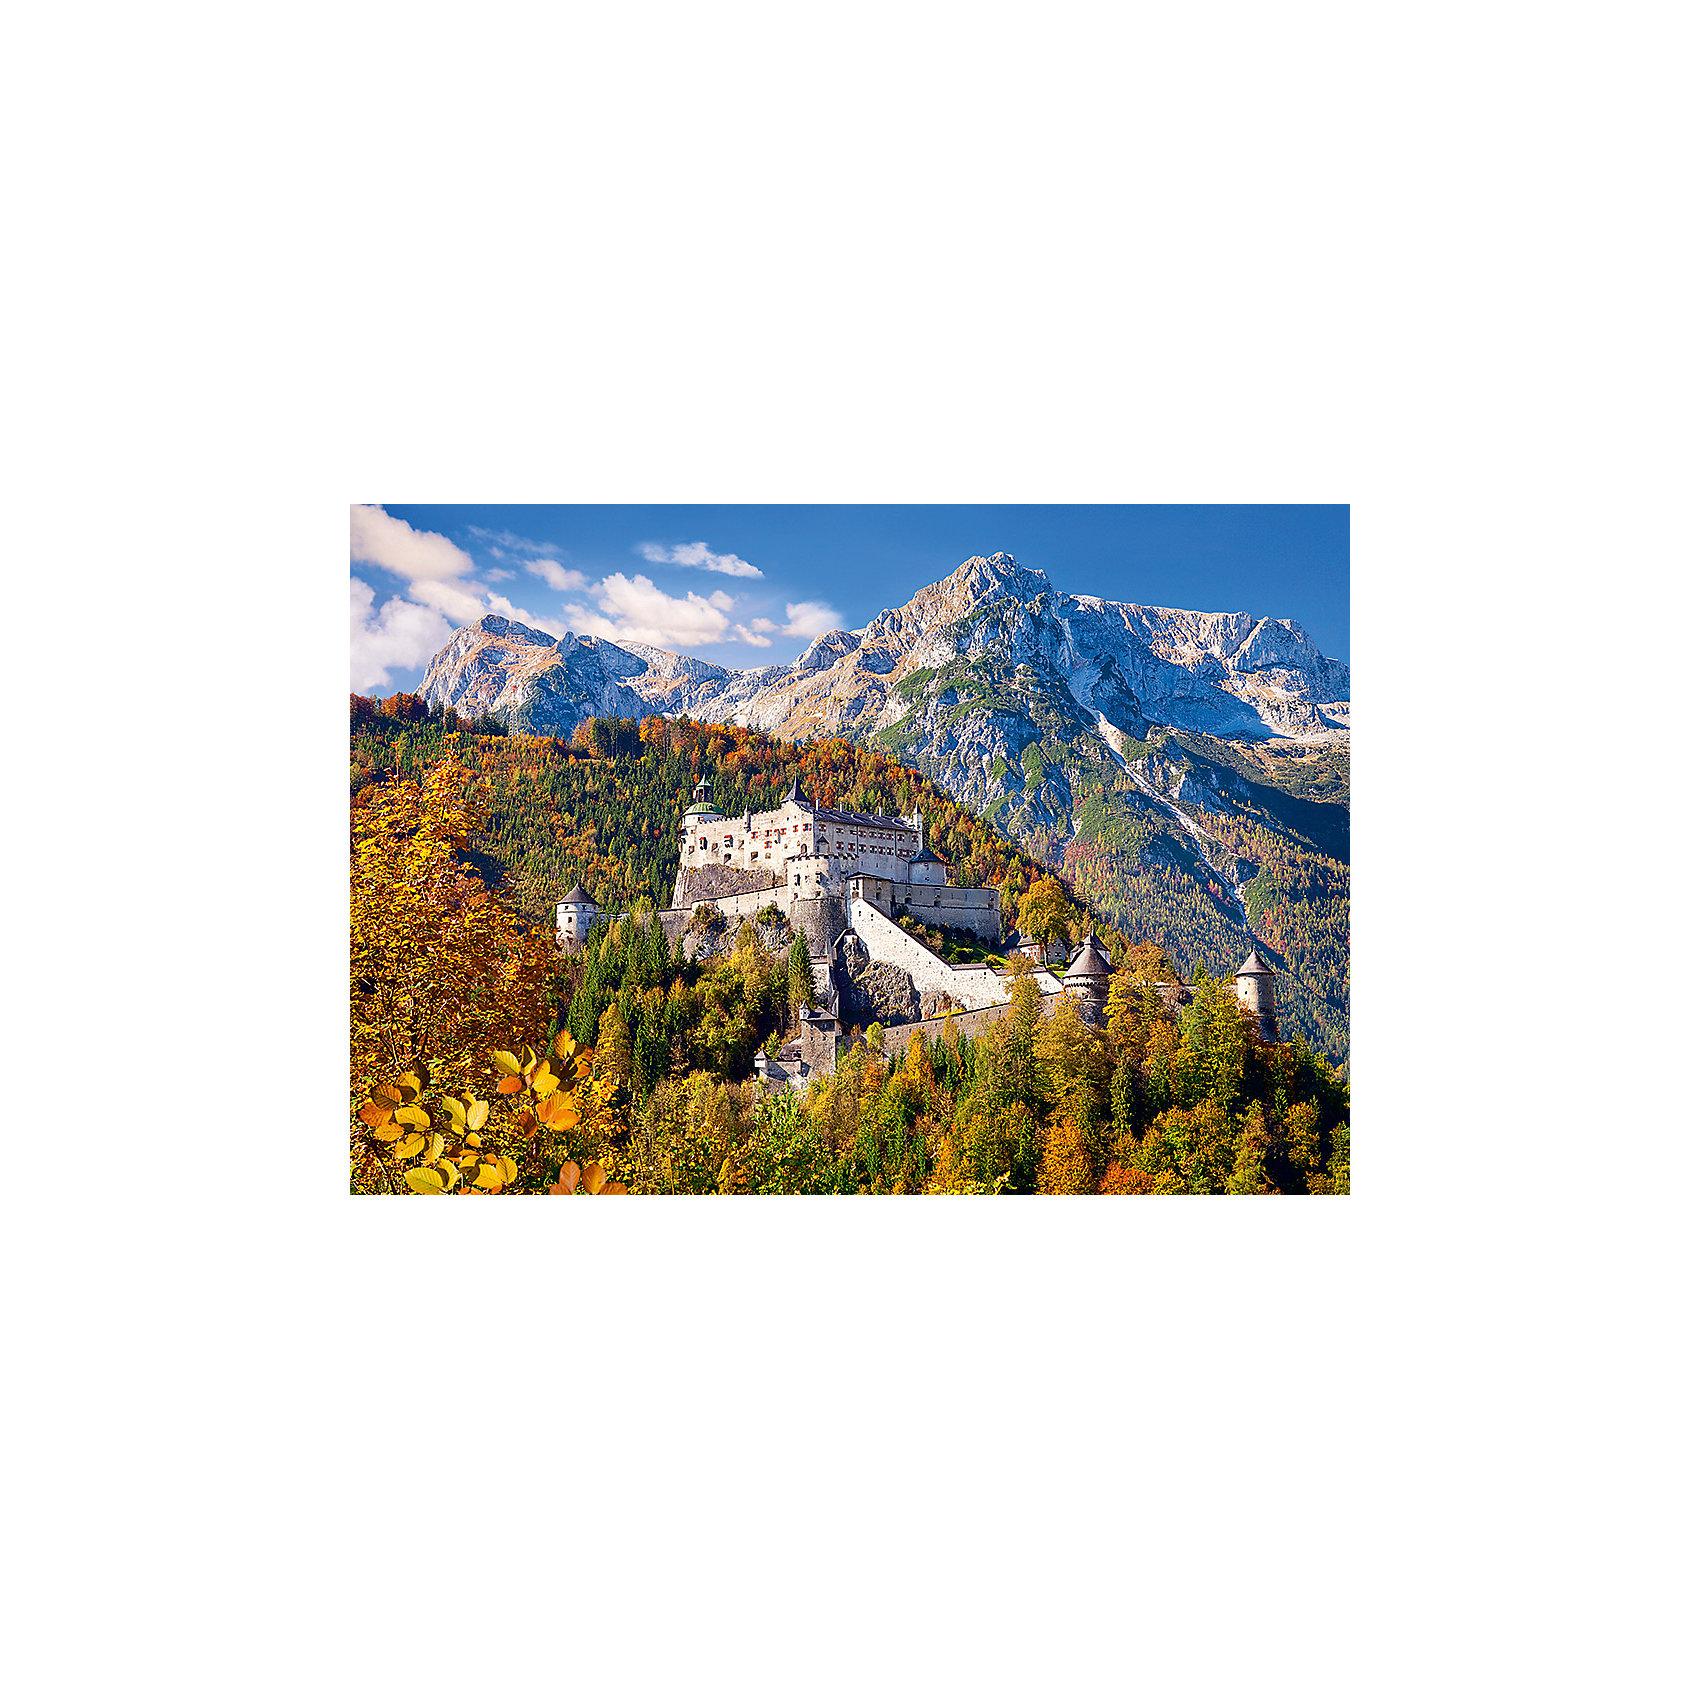 Пазл Замок, Австрия, 1000 деталей, Castorland<br><br>Ширина мм: 350<br>Глубина мм: 50<br>Высота мм: 250<br>Вес г: 500<br>Возраст от месяцев: 168<br>Возраст до месяцев: 1188<br>Пол: Унисекс<br>Возраст: Детский<br>SKU: 4879218